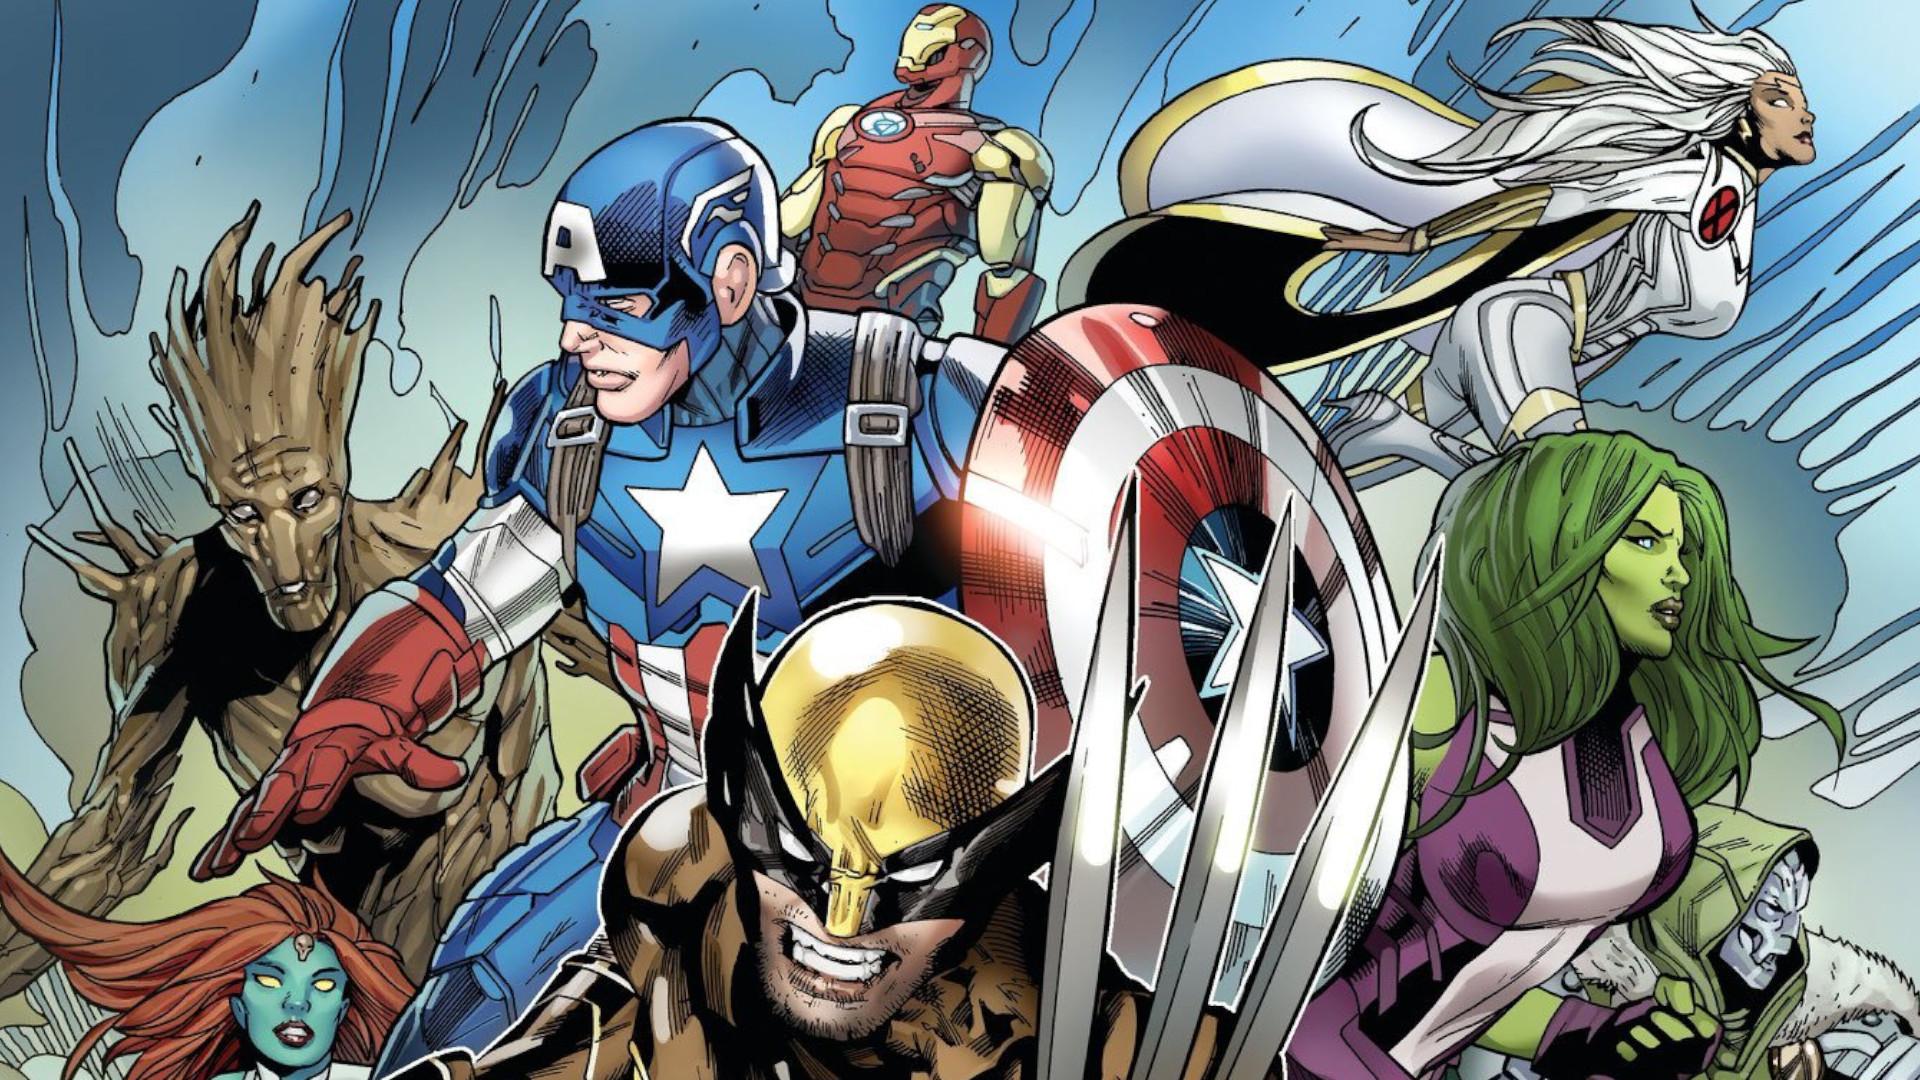 Fortnite Season 4 Teases Herald A Marvel Invasion Of Superheroes